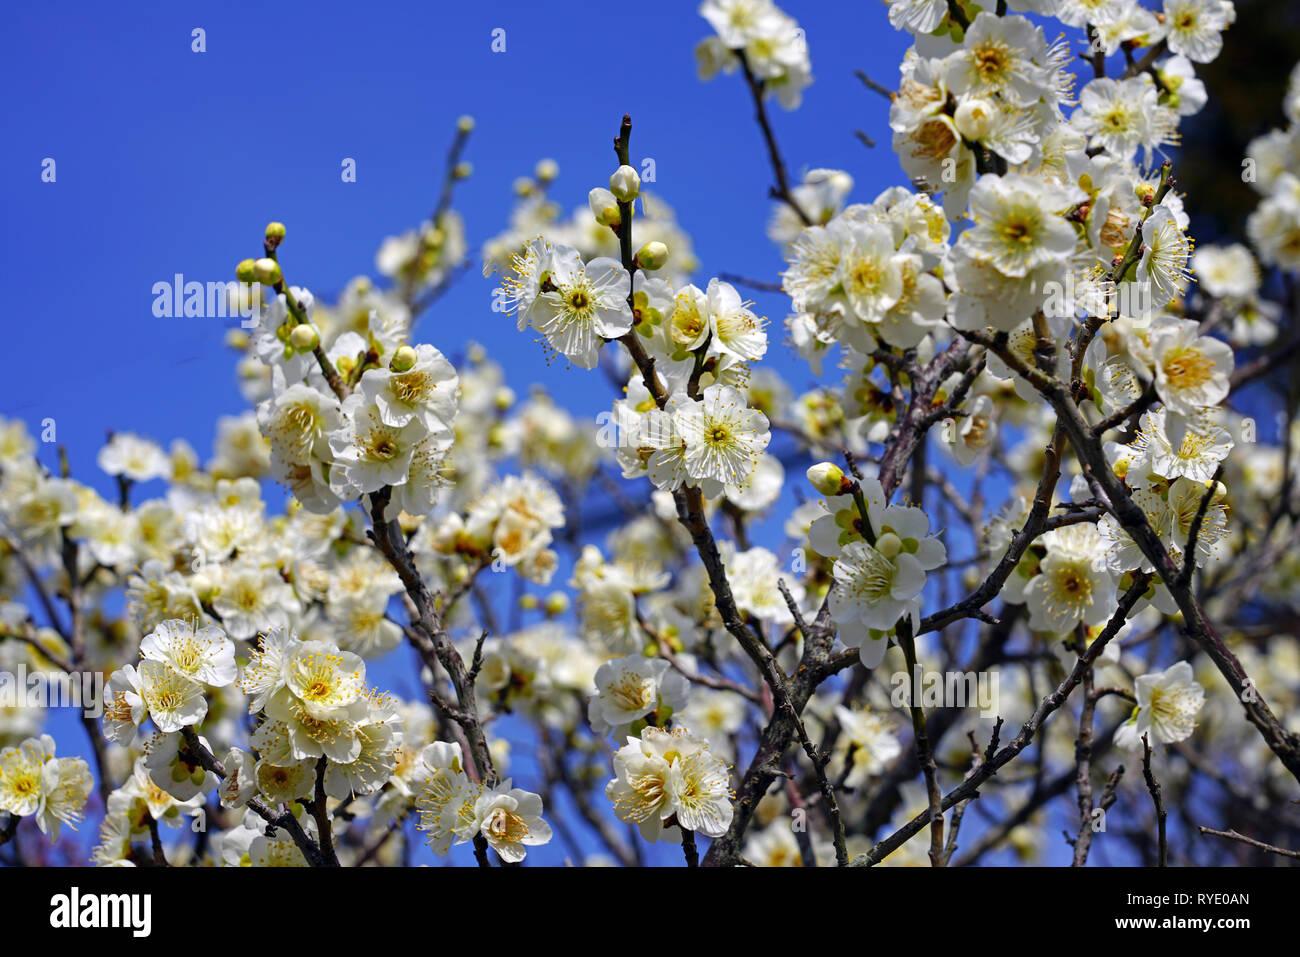 White Flower Blooms Of The Japanese Ume Apricot Tree Prunus Mume